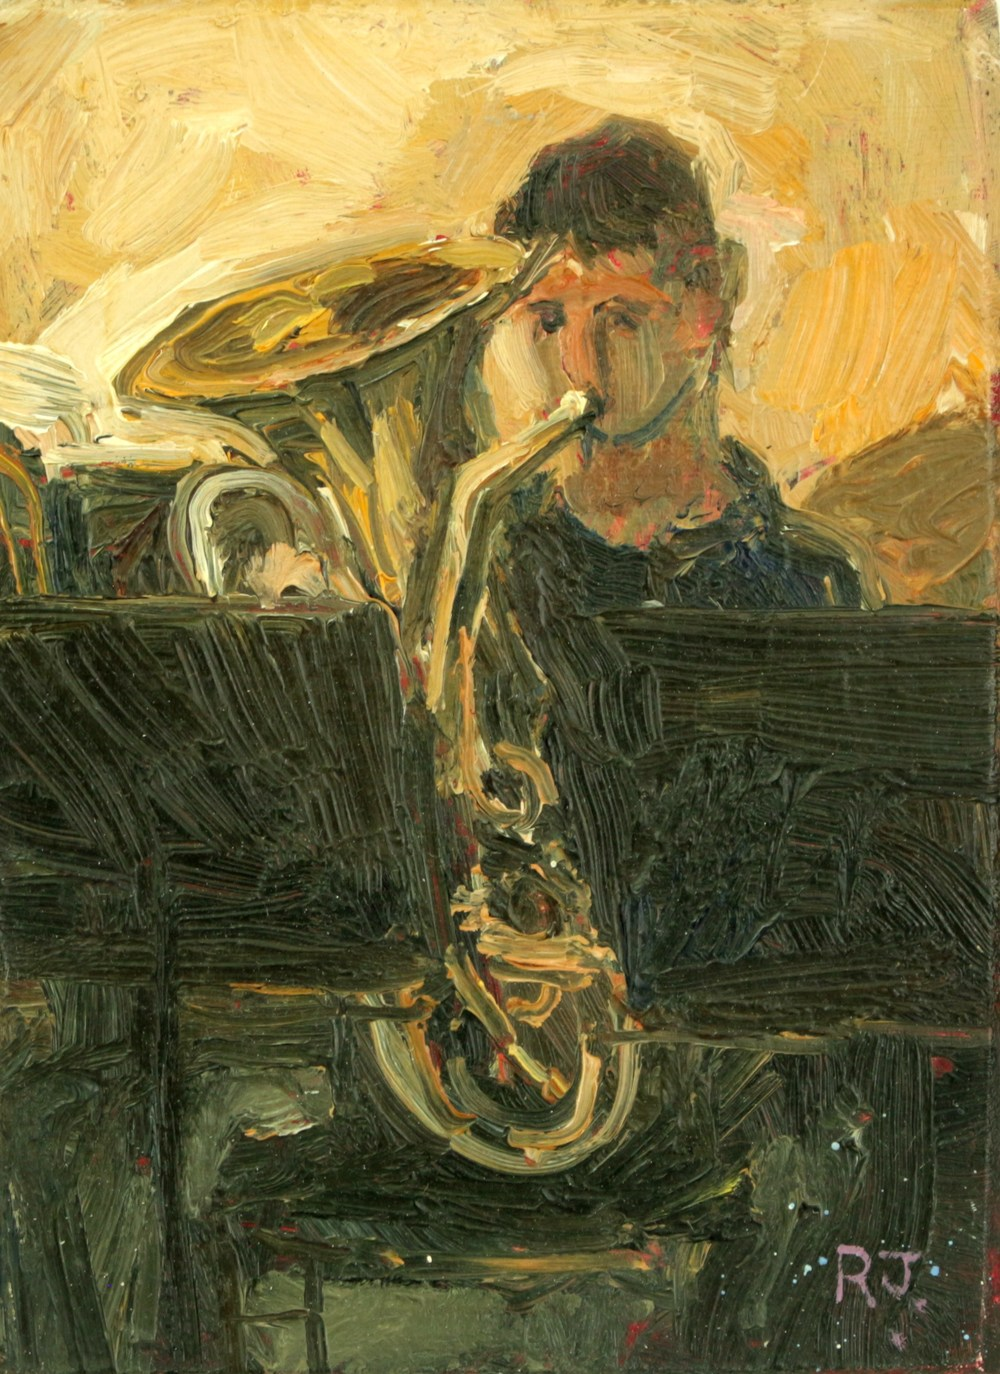 104. brass band iii